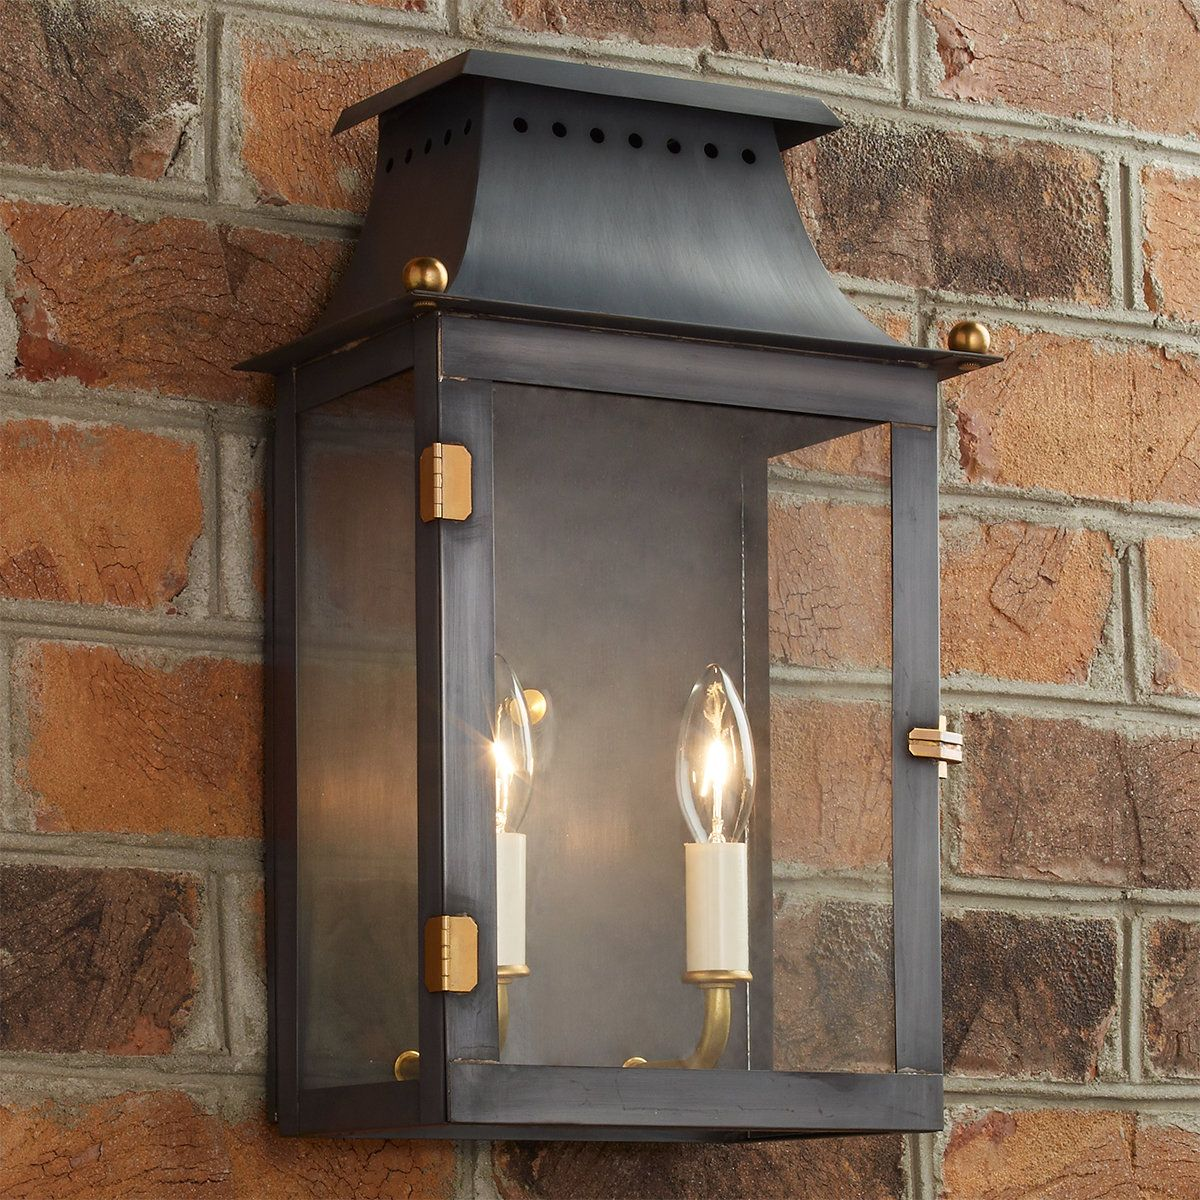 Franklin Outdoor Wall Light In 2020 Outdoor Wall Lighting Wall Lights Outdoor Hanging Lanterns